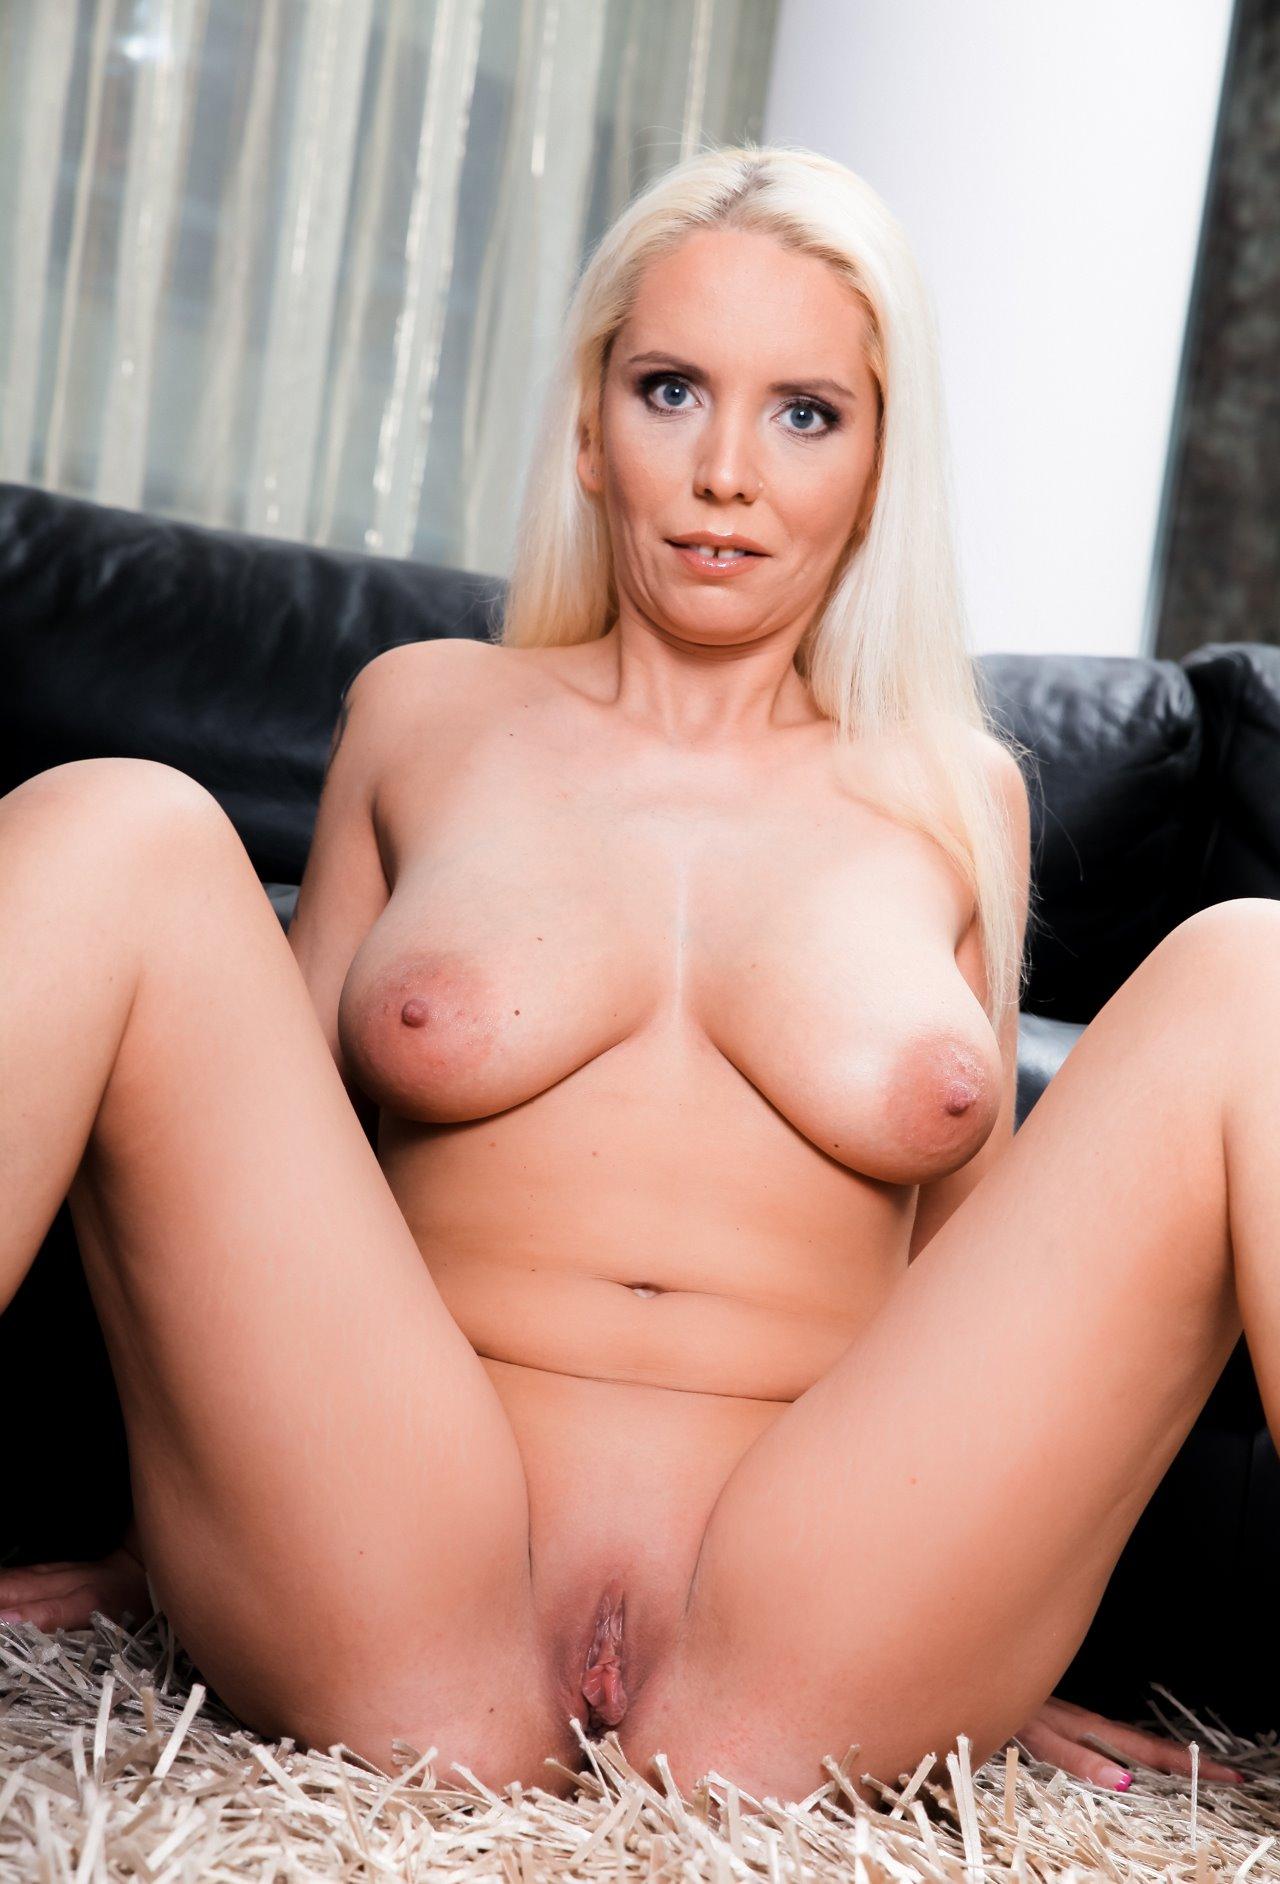 Darcie belle gets fucked during her massage 2